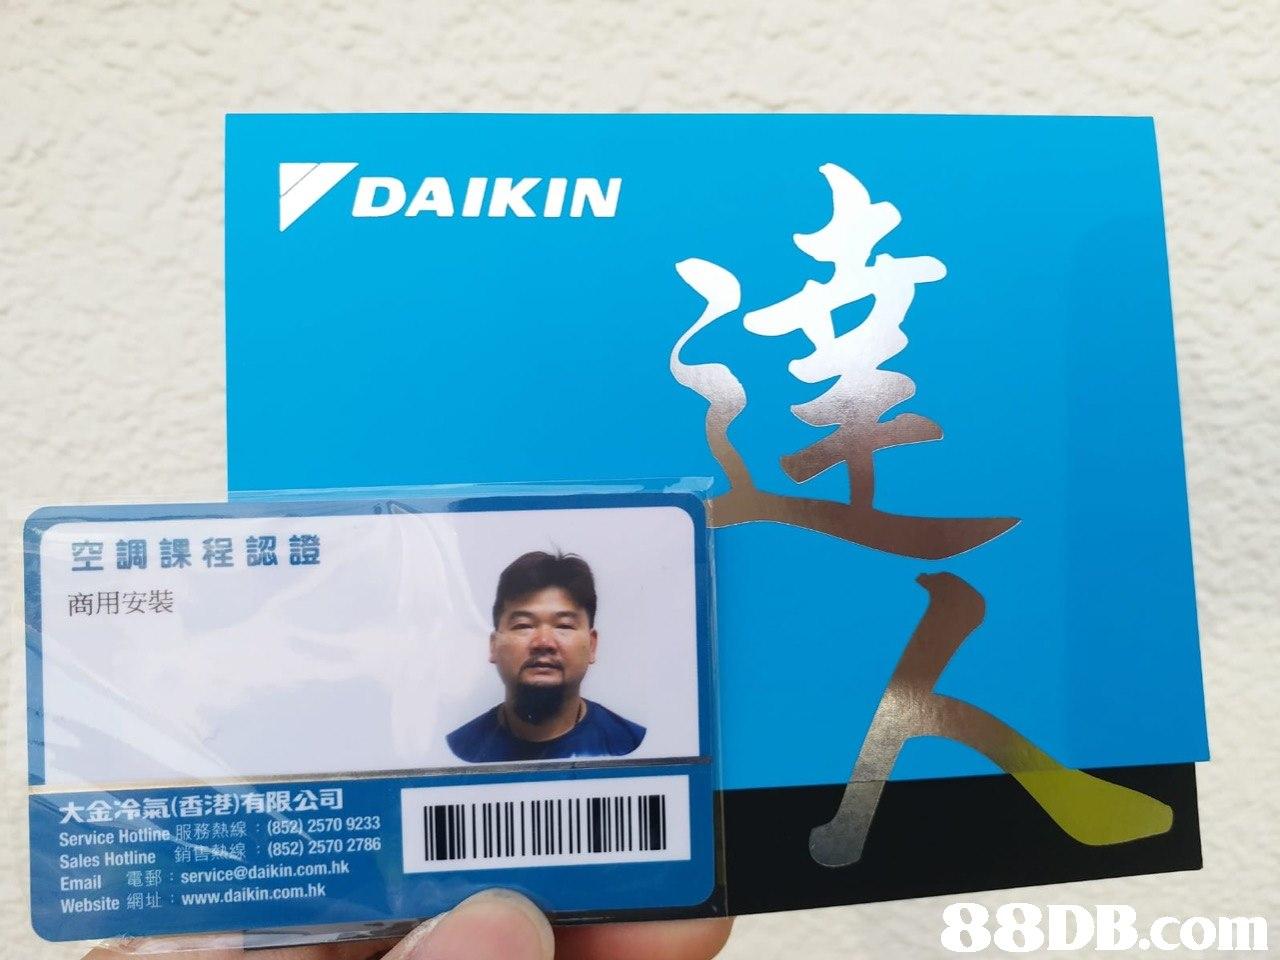 DAIKIN 空調課程認證 商用安裝 大金冷氣(香港)有限公司 Service Hotline,服務熱線: 522570 9233 Sales Hotline Email 電郵: service@daikin.com.hk Website網址: www.daikin.com.hk (852) 2570 2786   Font,Paper product,